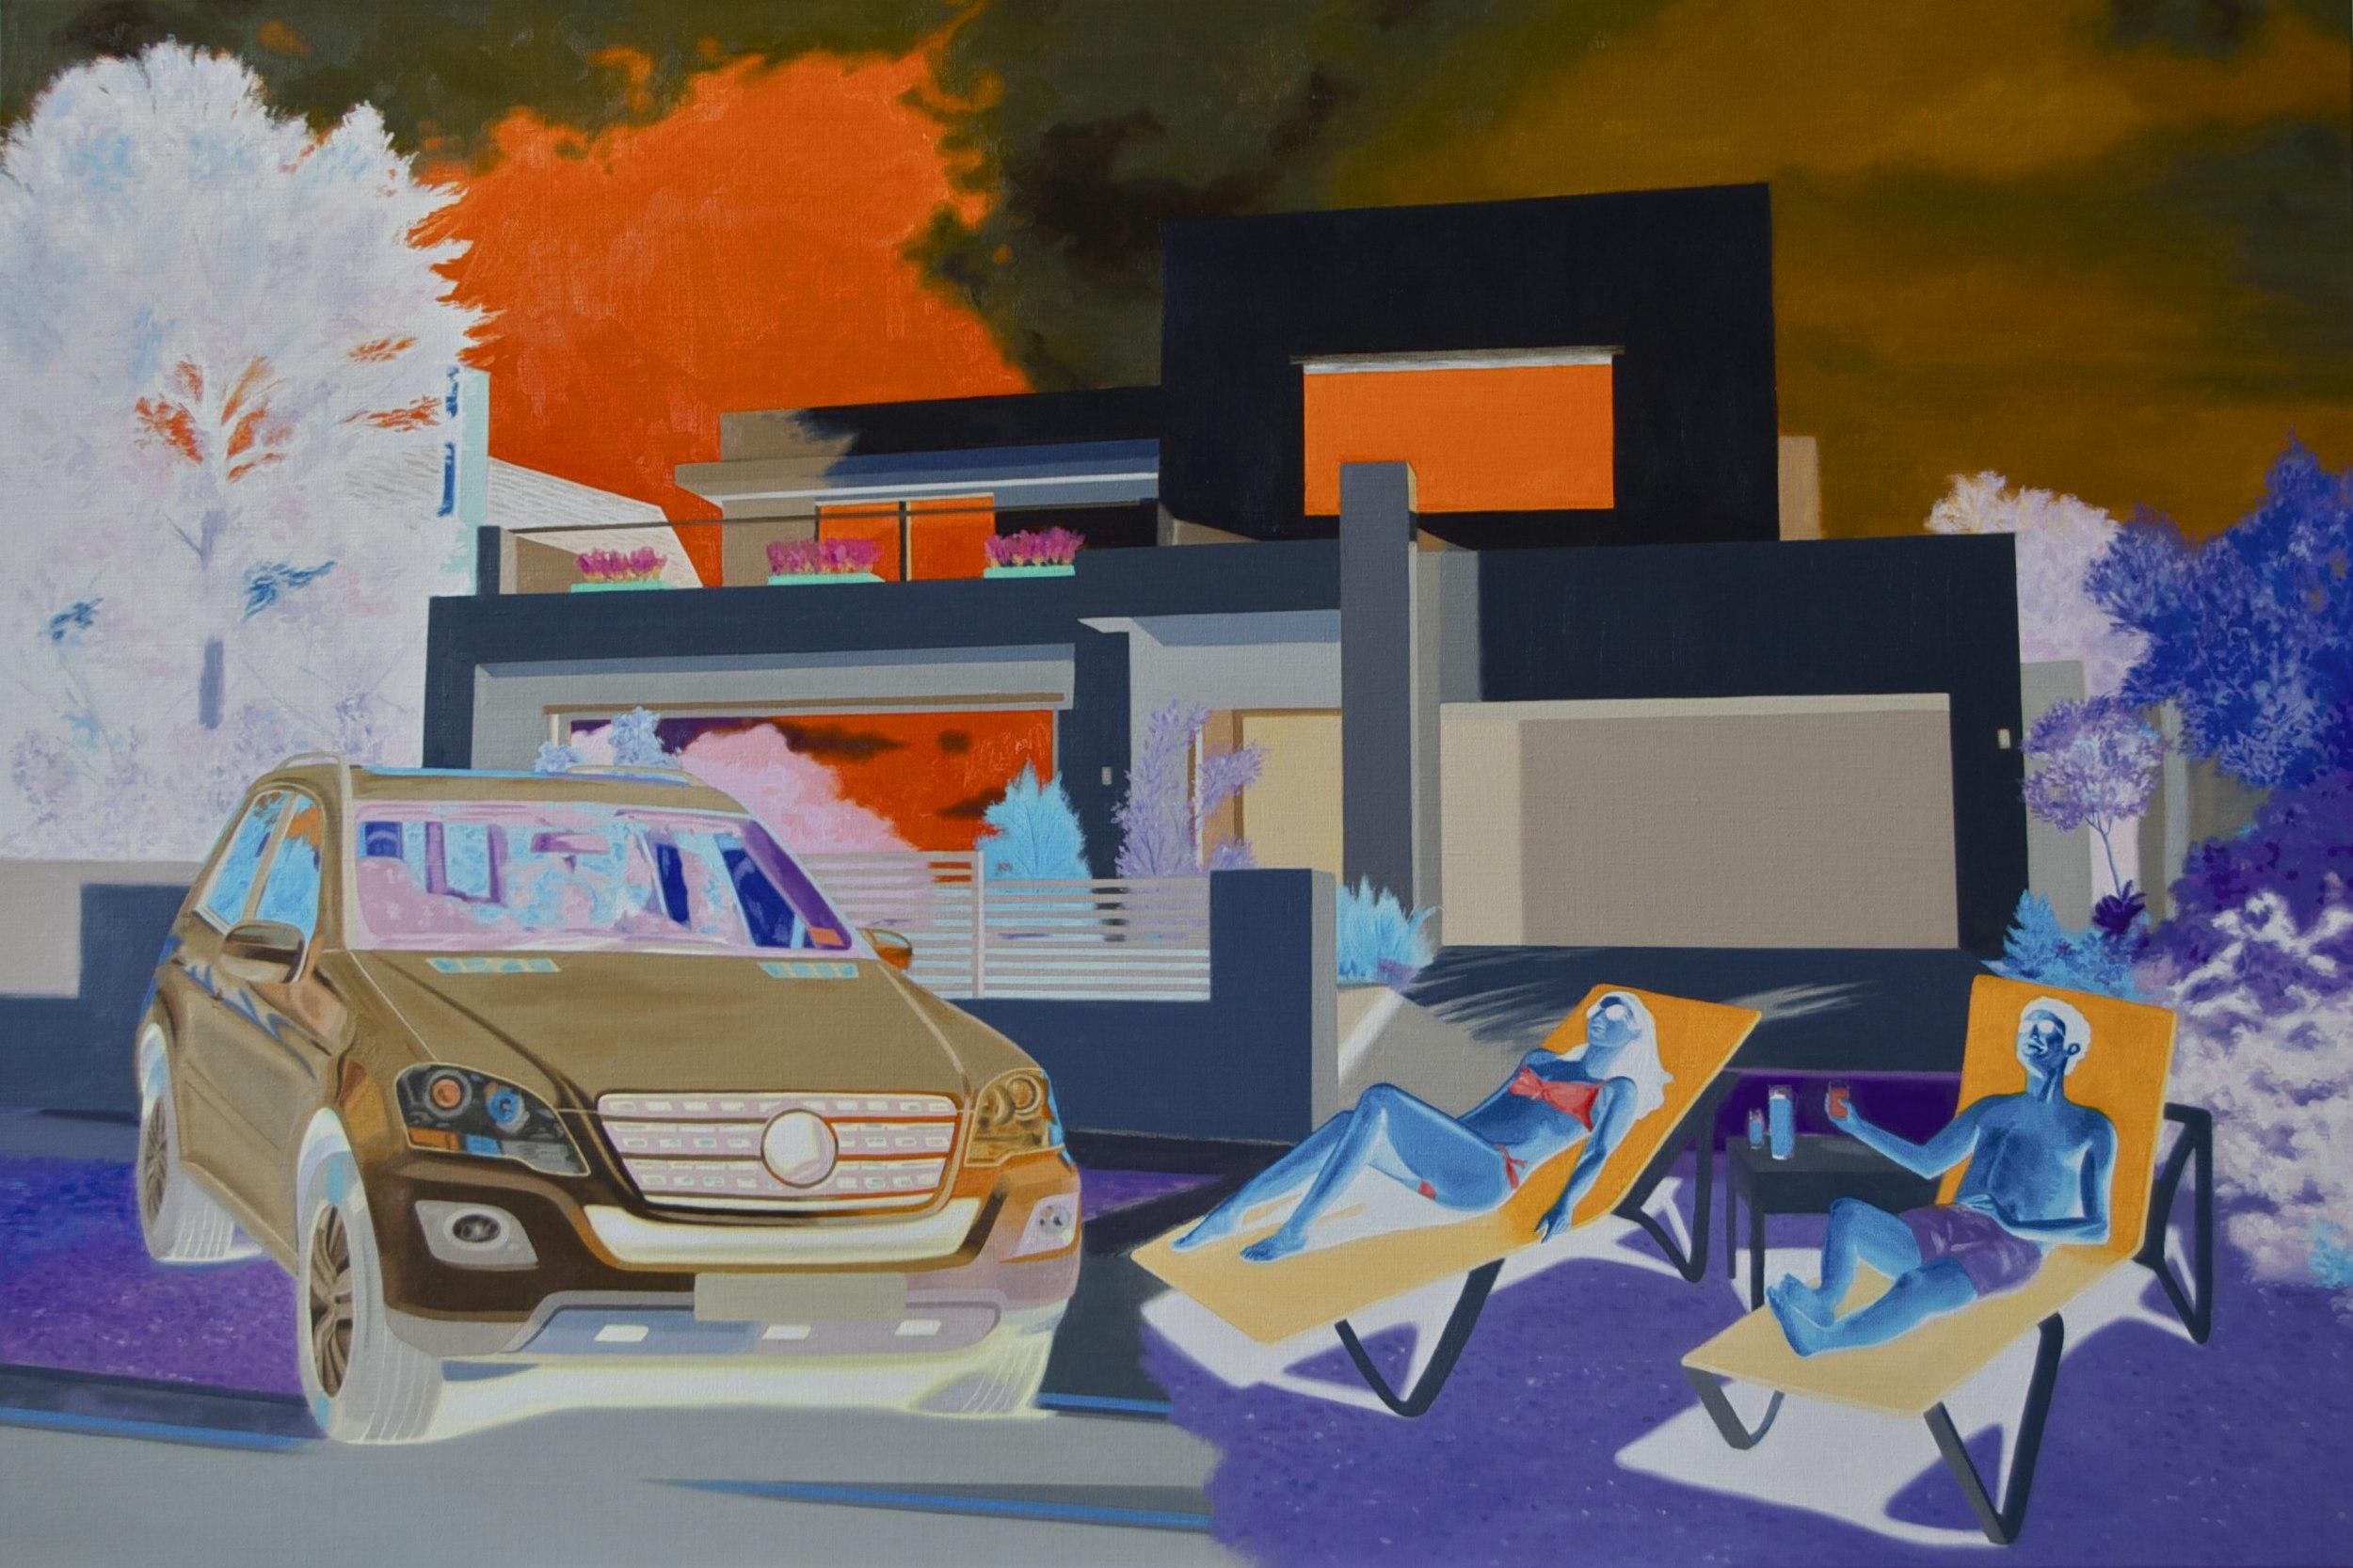 Richard Knafelc  Running on empty  2014 oil on linen 102 x 152.5 cm